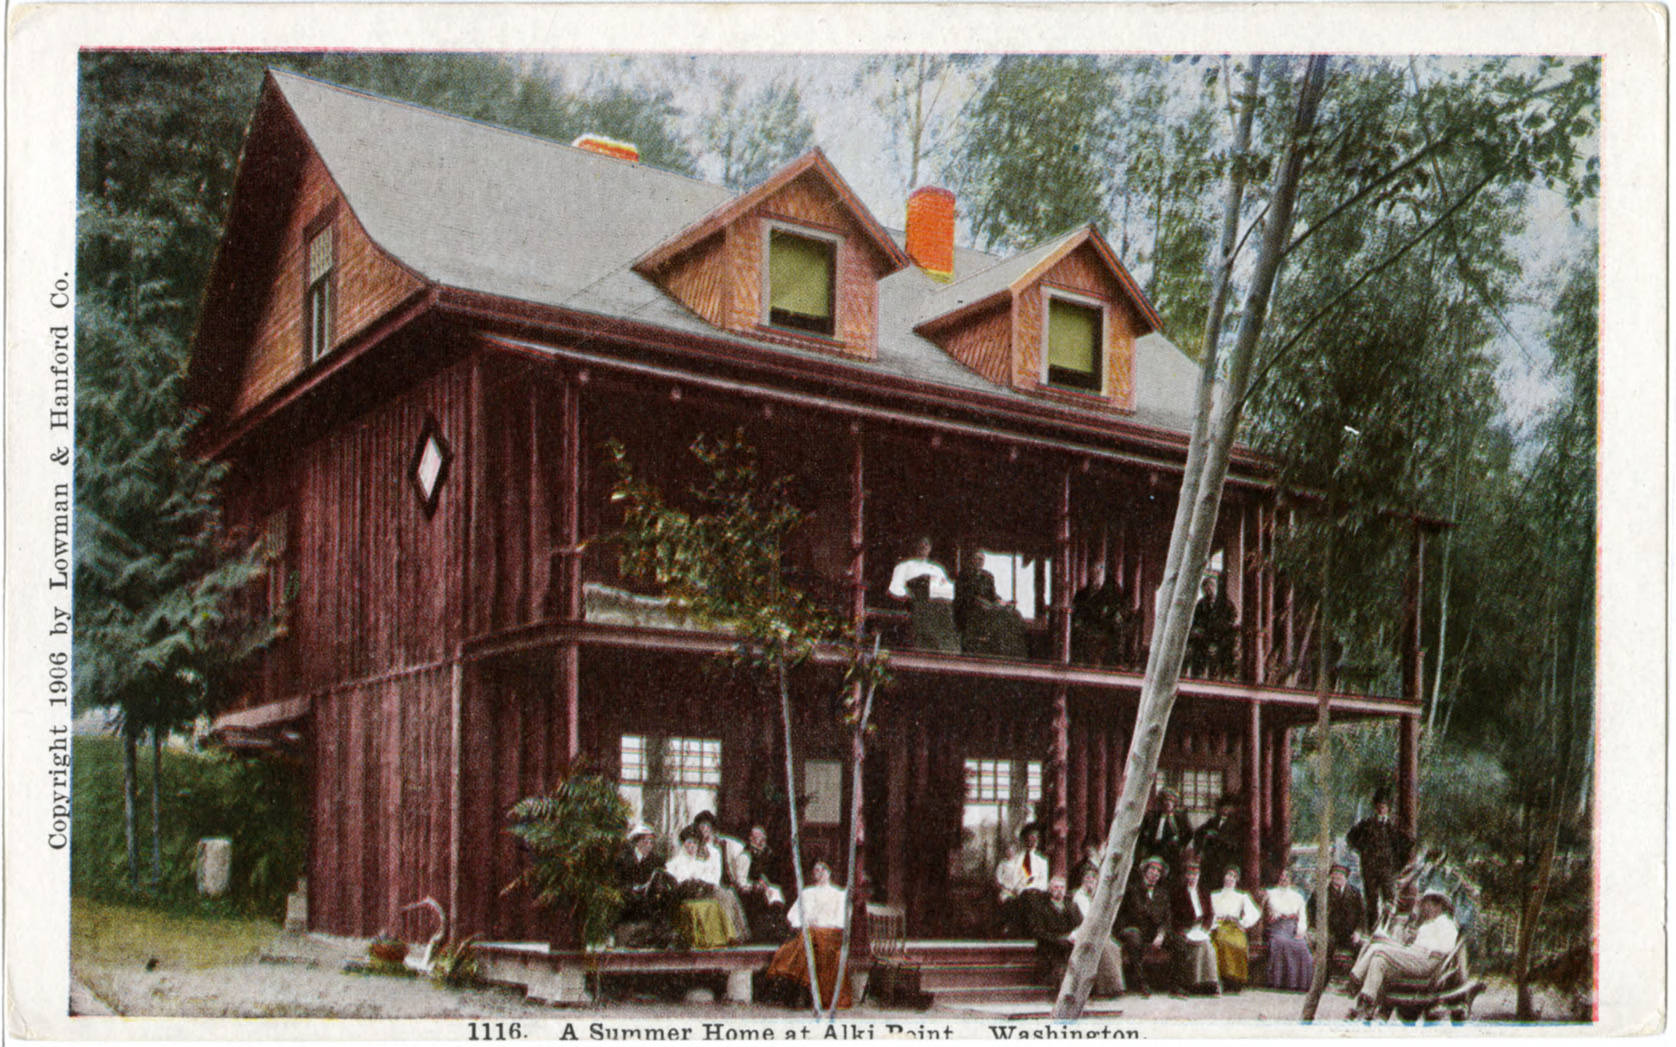 A Summer Home at Alki Point Washington, 1906